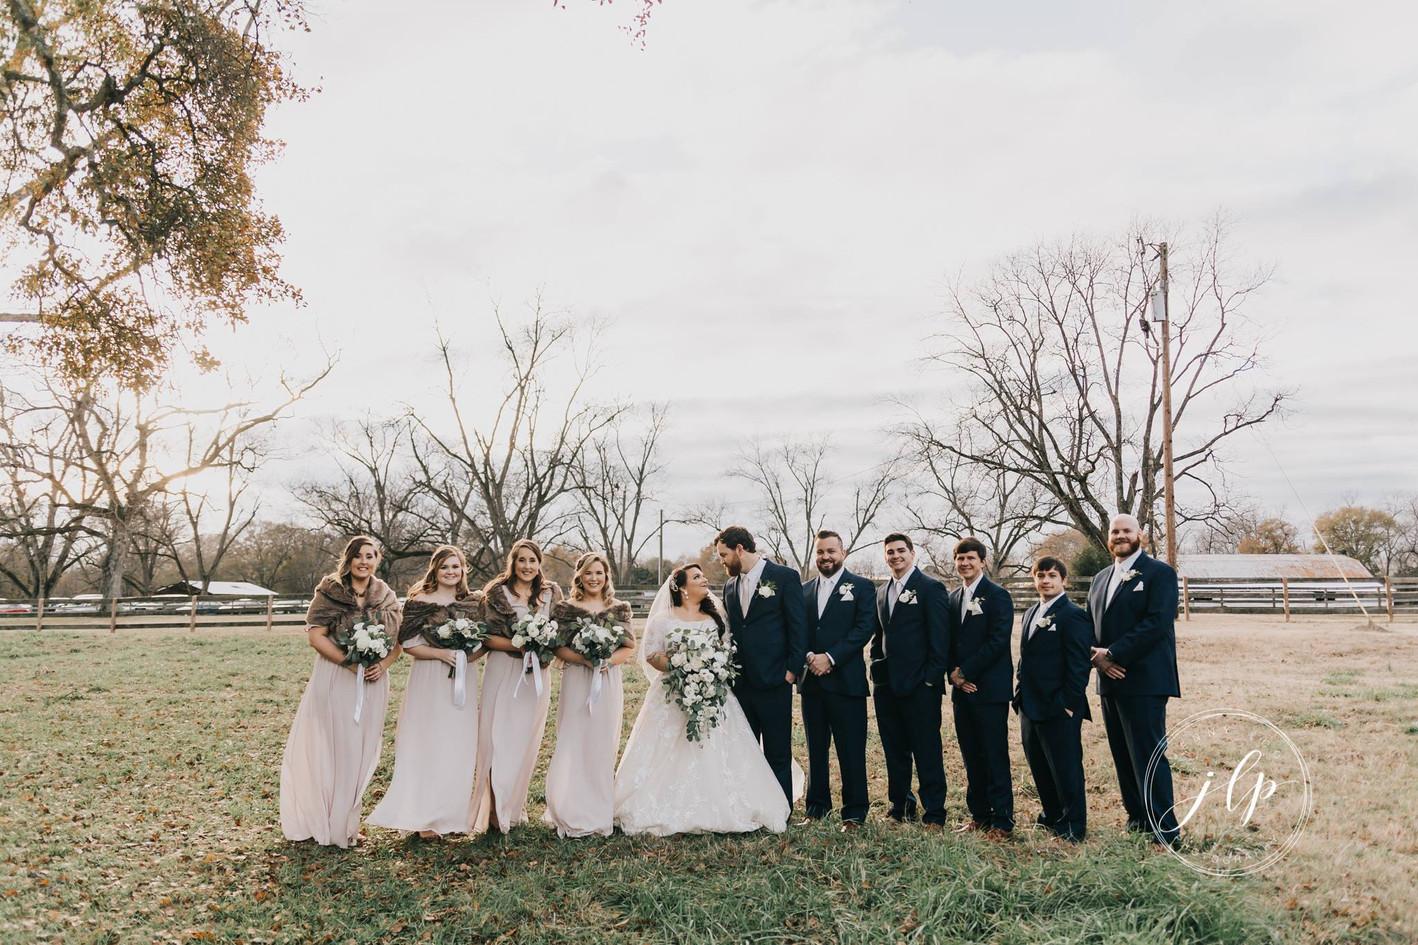 Jacey & Blake wedding party.jpg